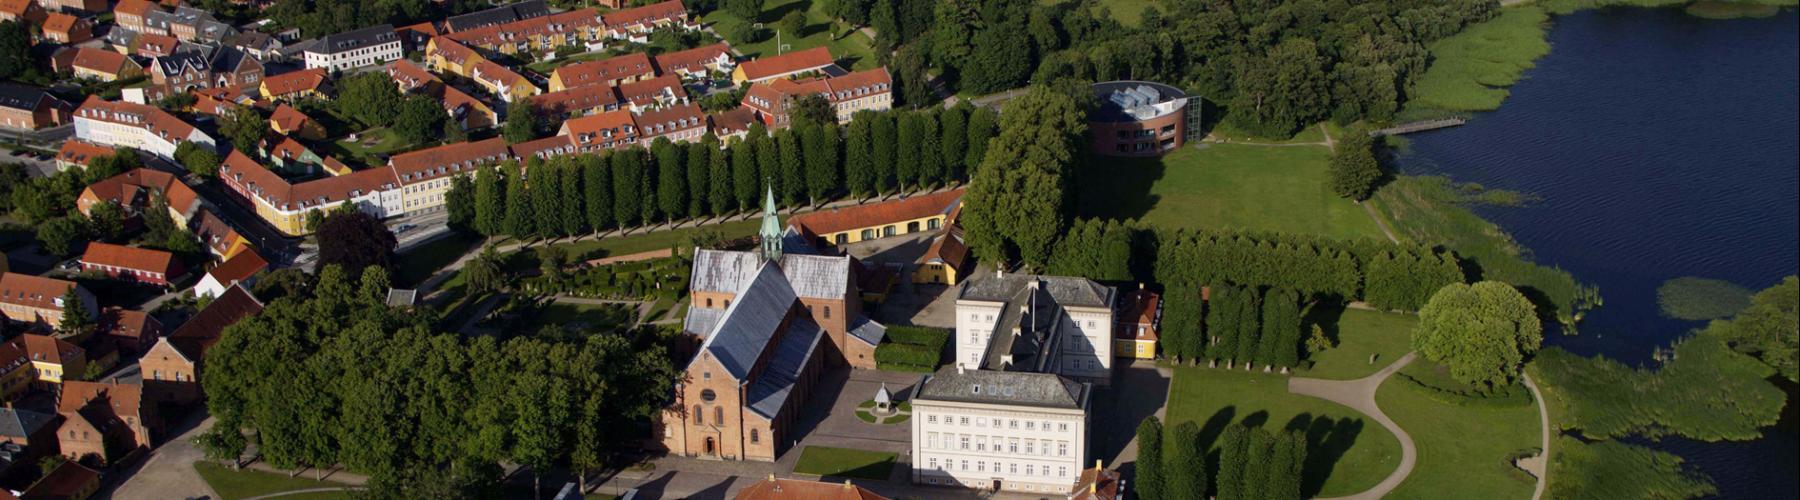 Sorø Kommune cover image